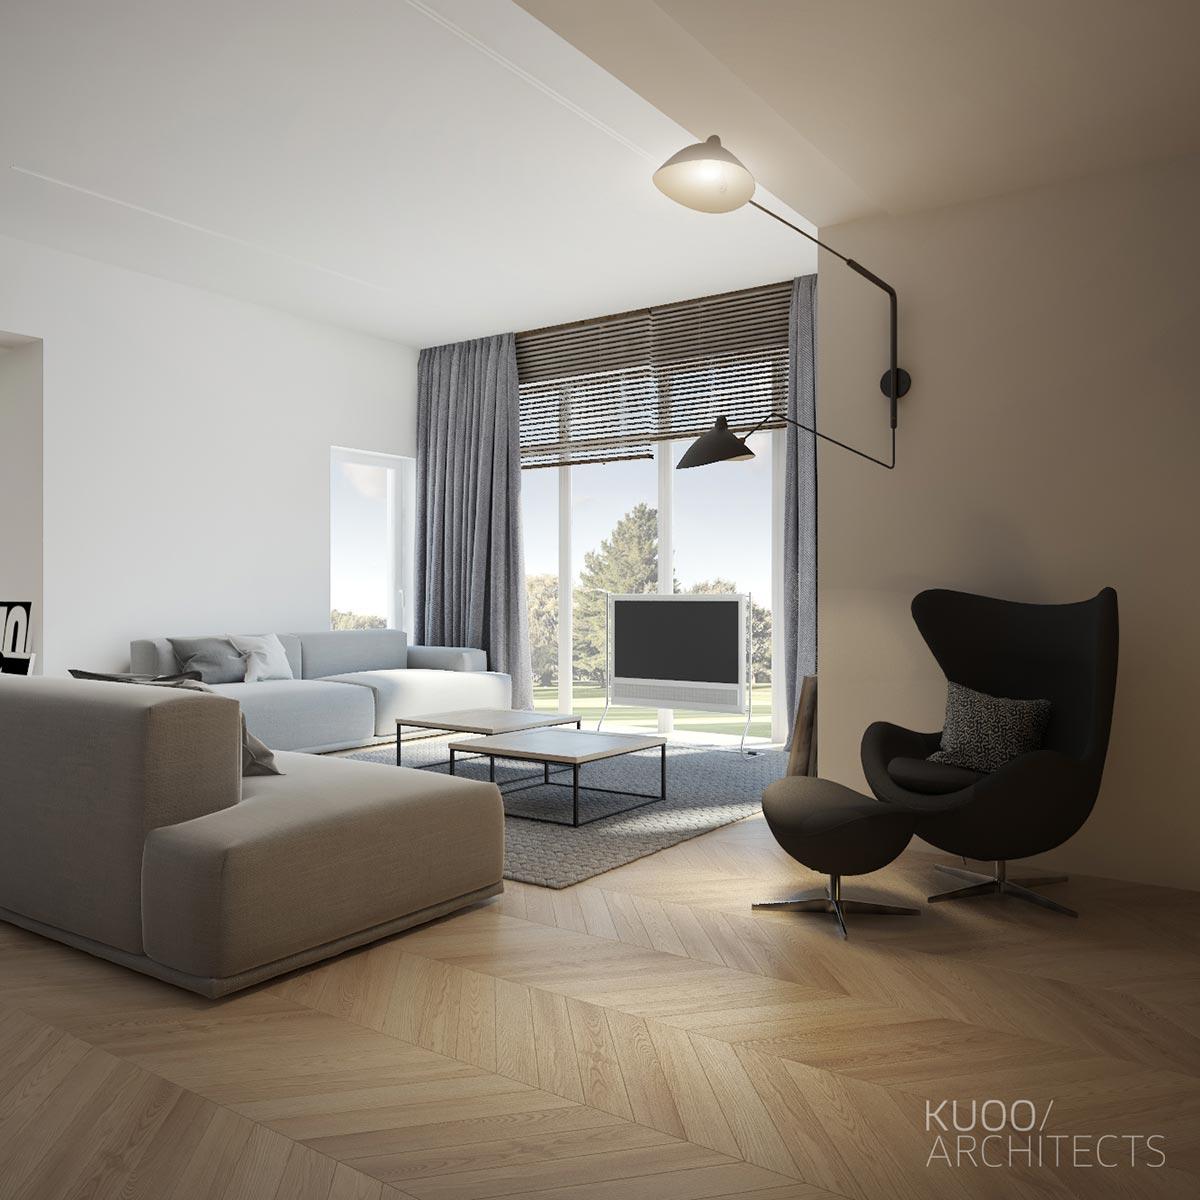 77_kuoo_architects_interior_design_minimal_contemporary_logo